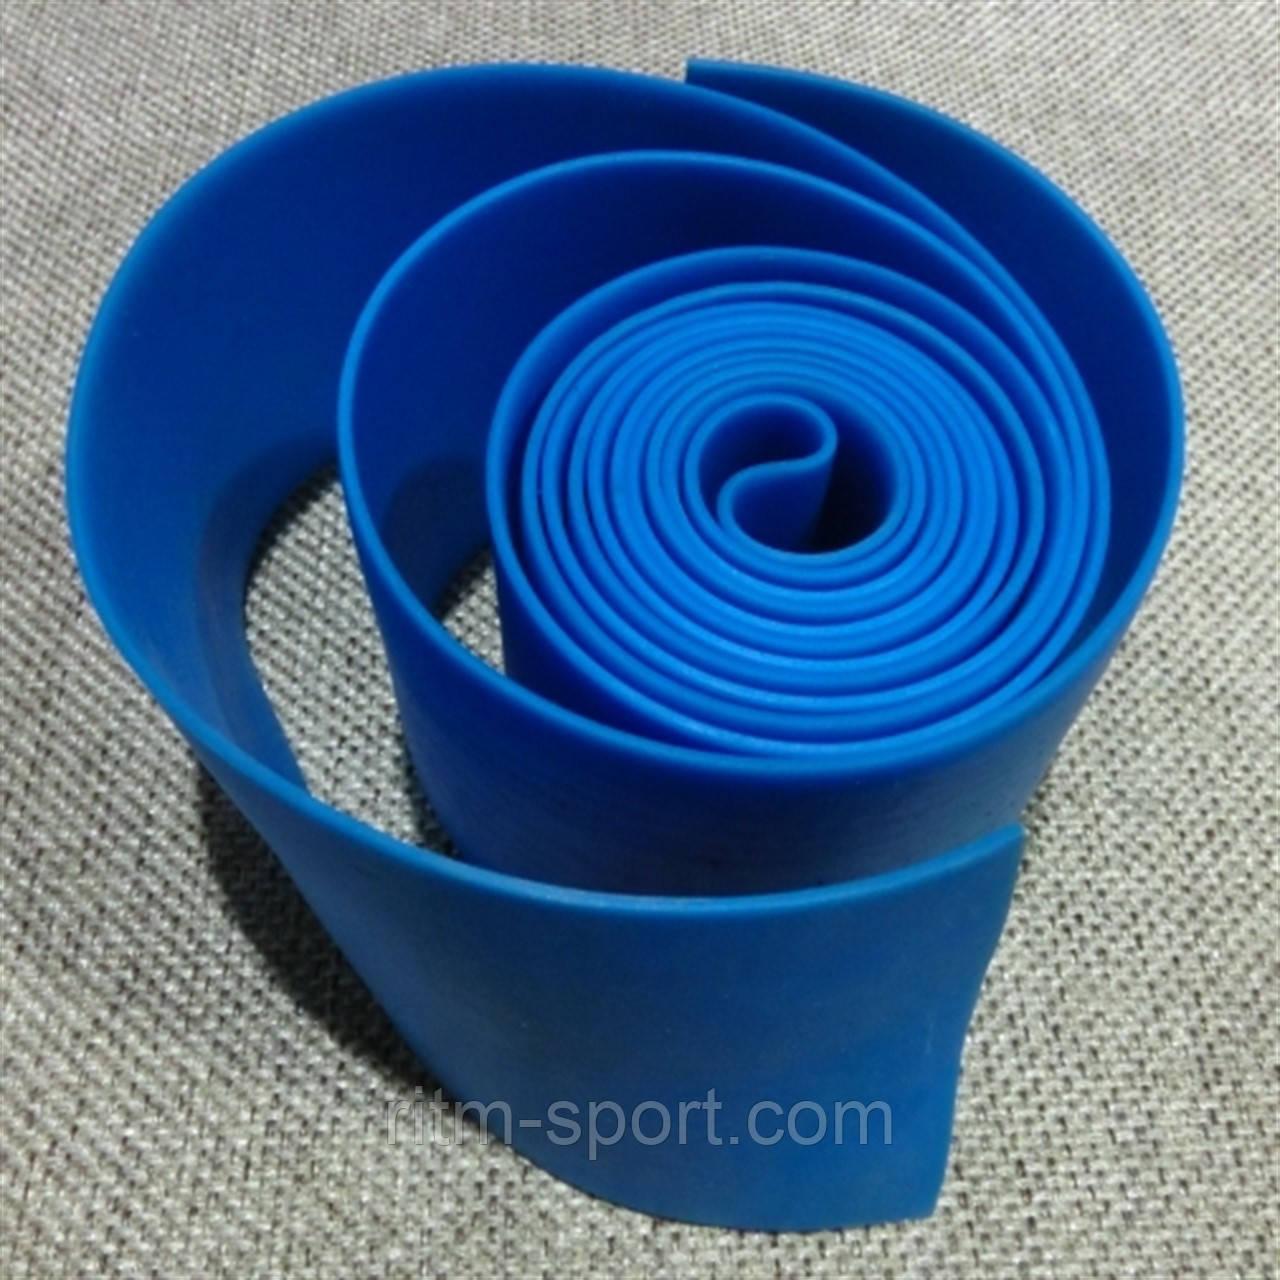 Лента жгут VooDoo Floss Band 250 см * 8 см * 0,2 см